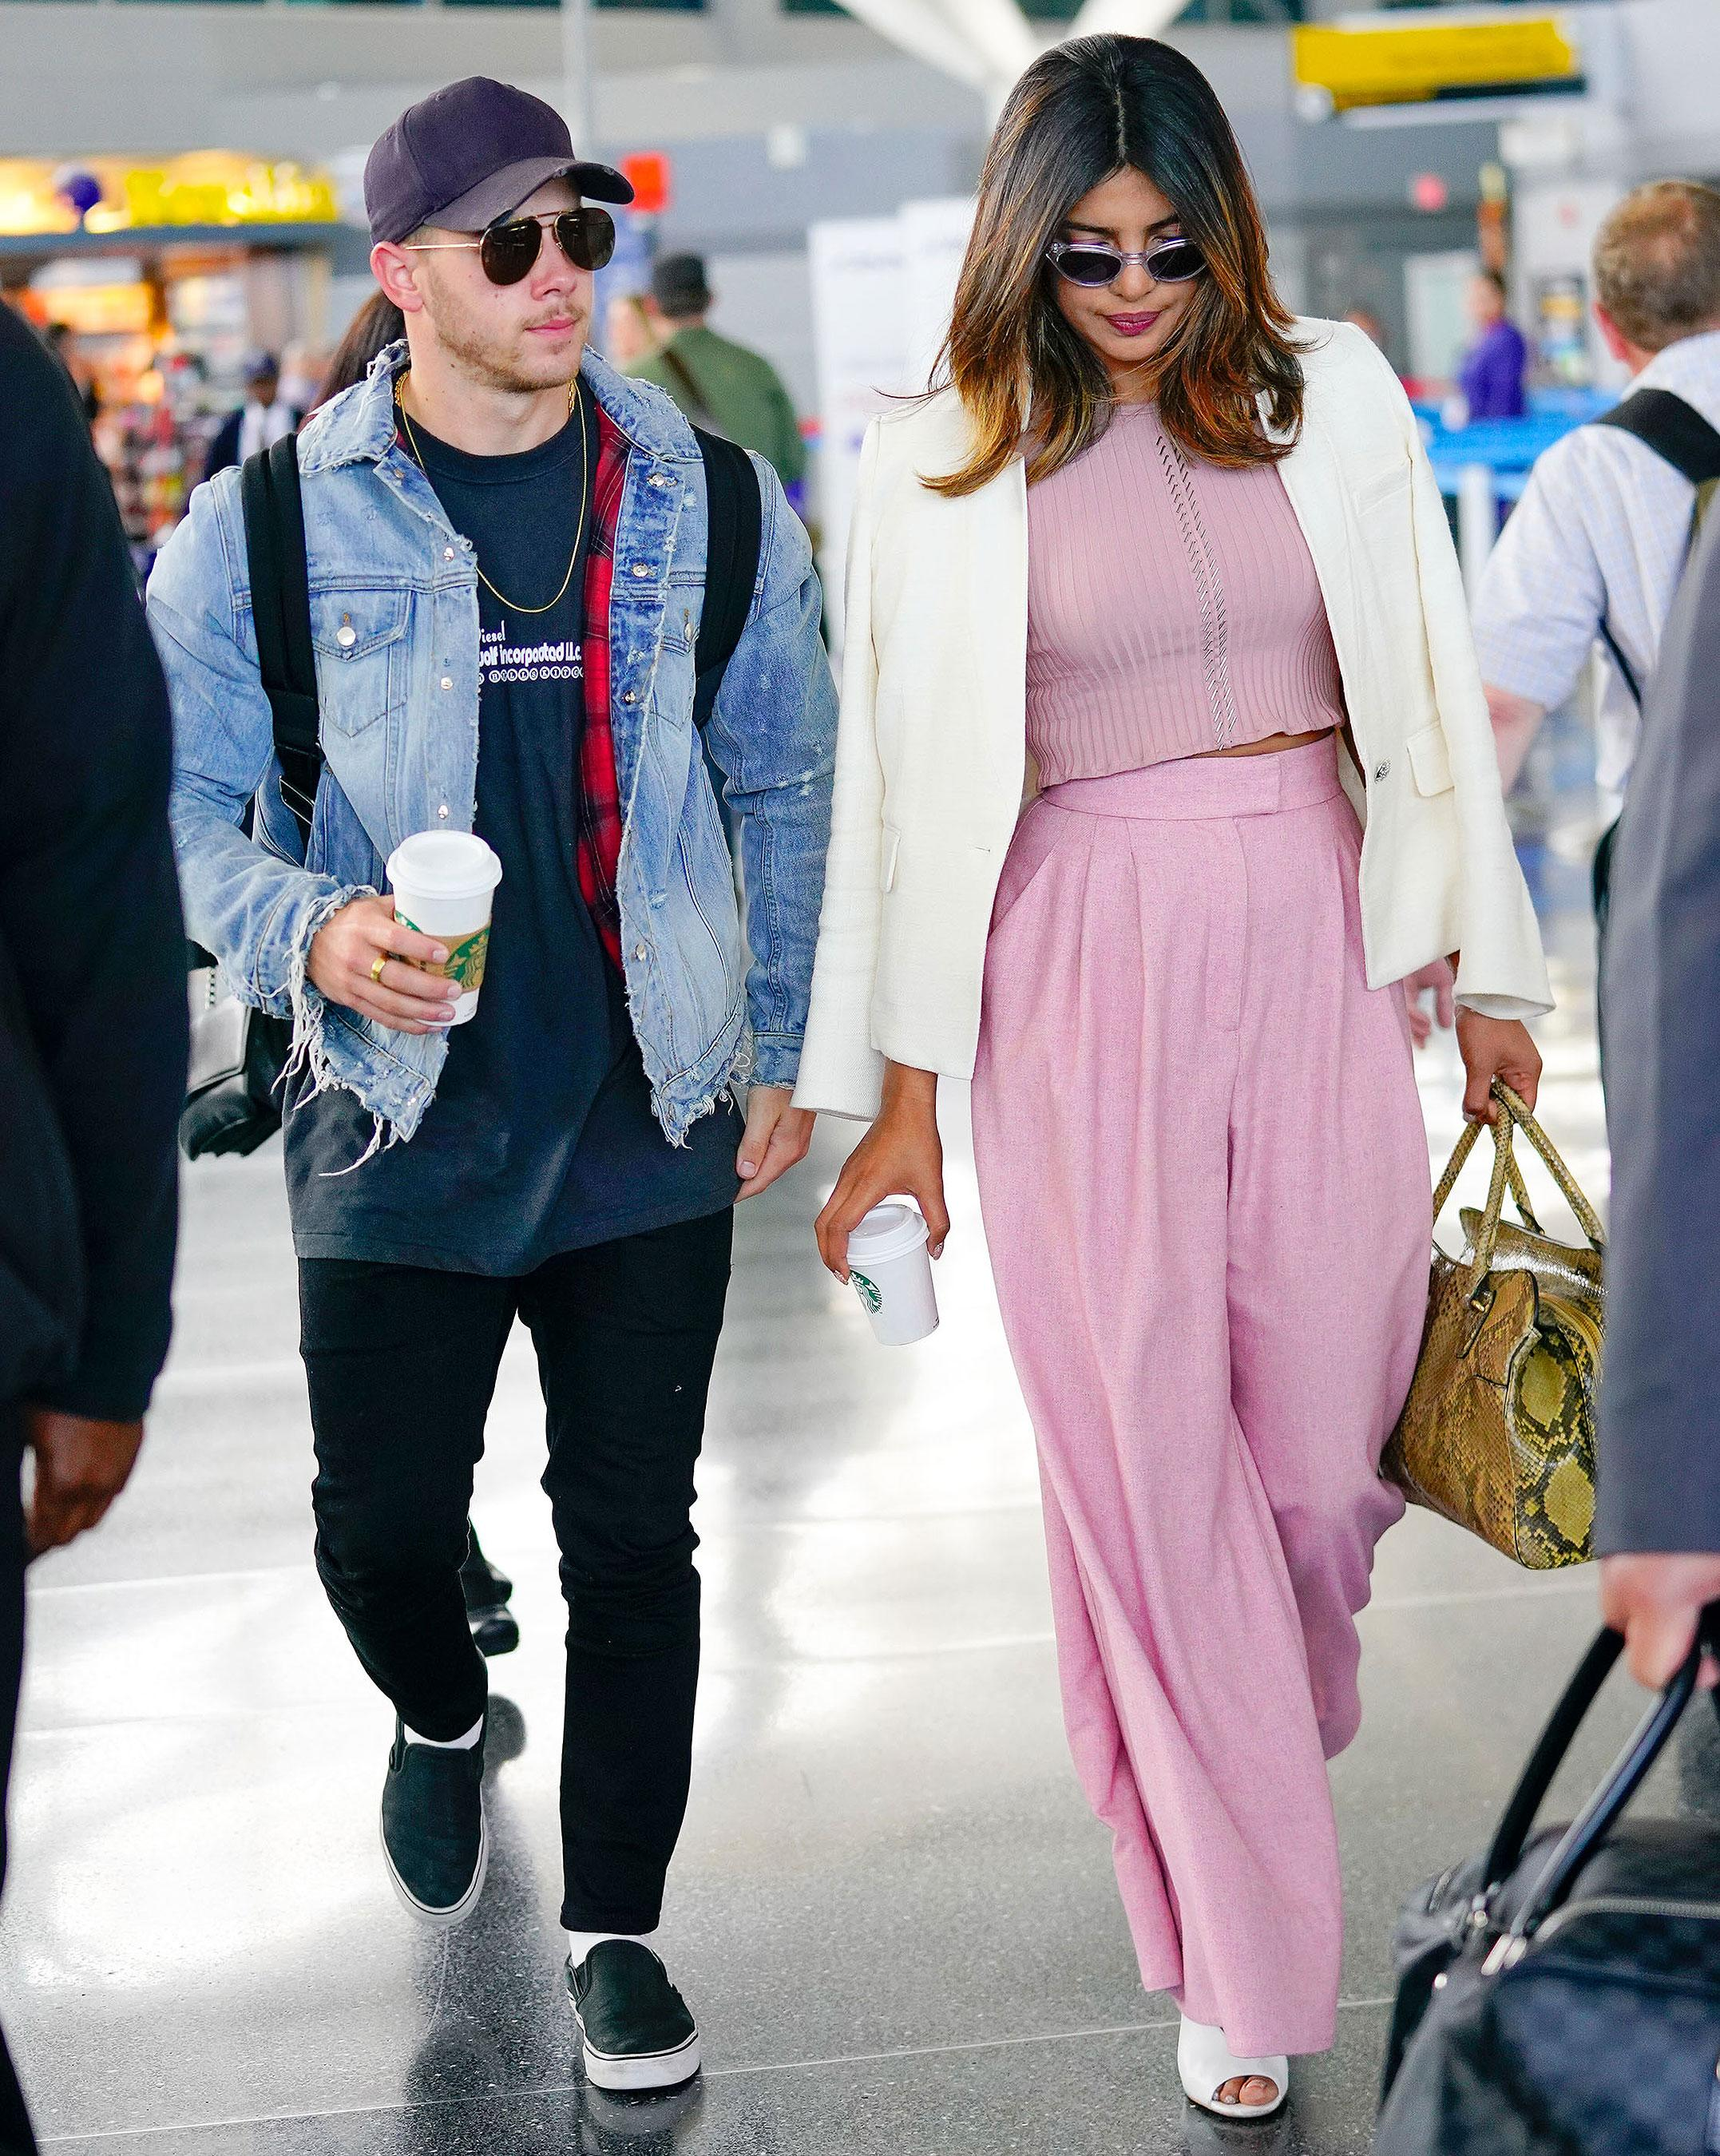 Nick Jonas And Priyanka Chopra Make Their Couple Debut At Jfk